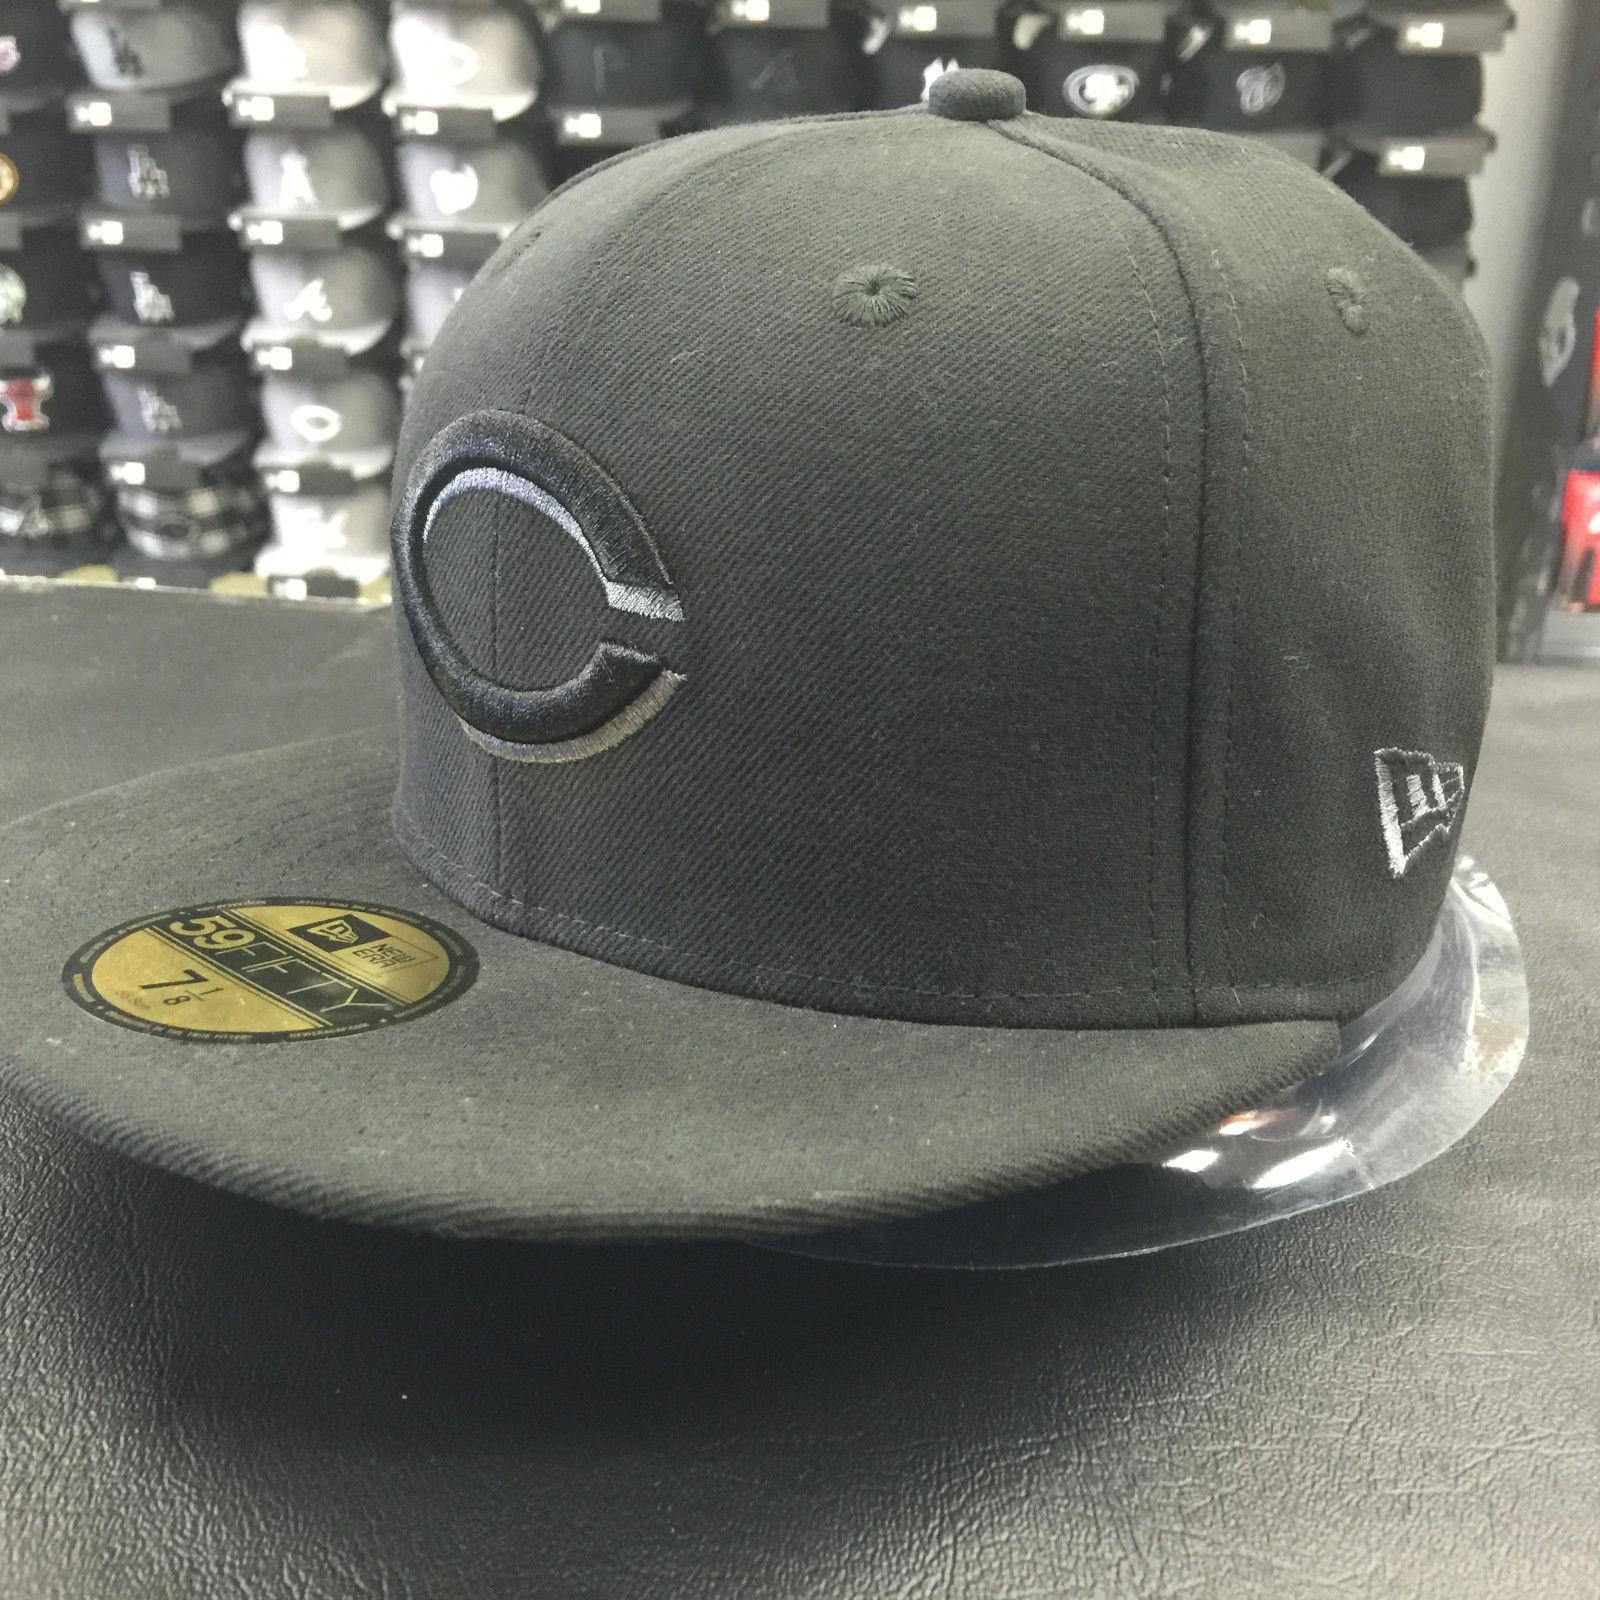 New Era 59Fifty Cincinnati Reds Black Gray Basic Fitted Cap